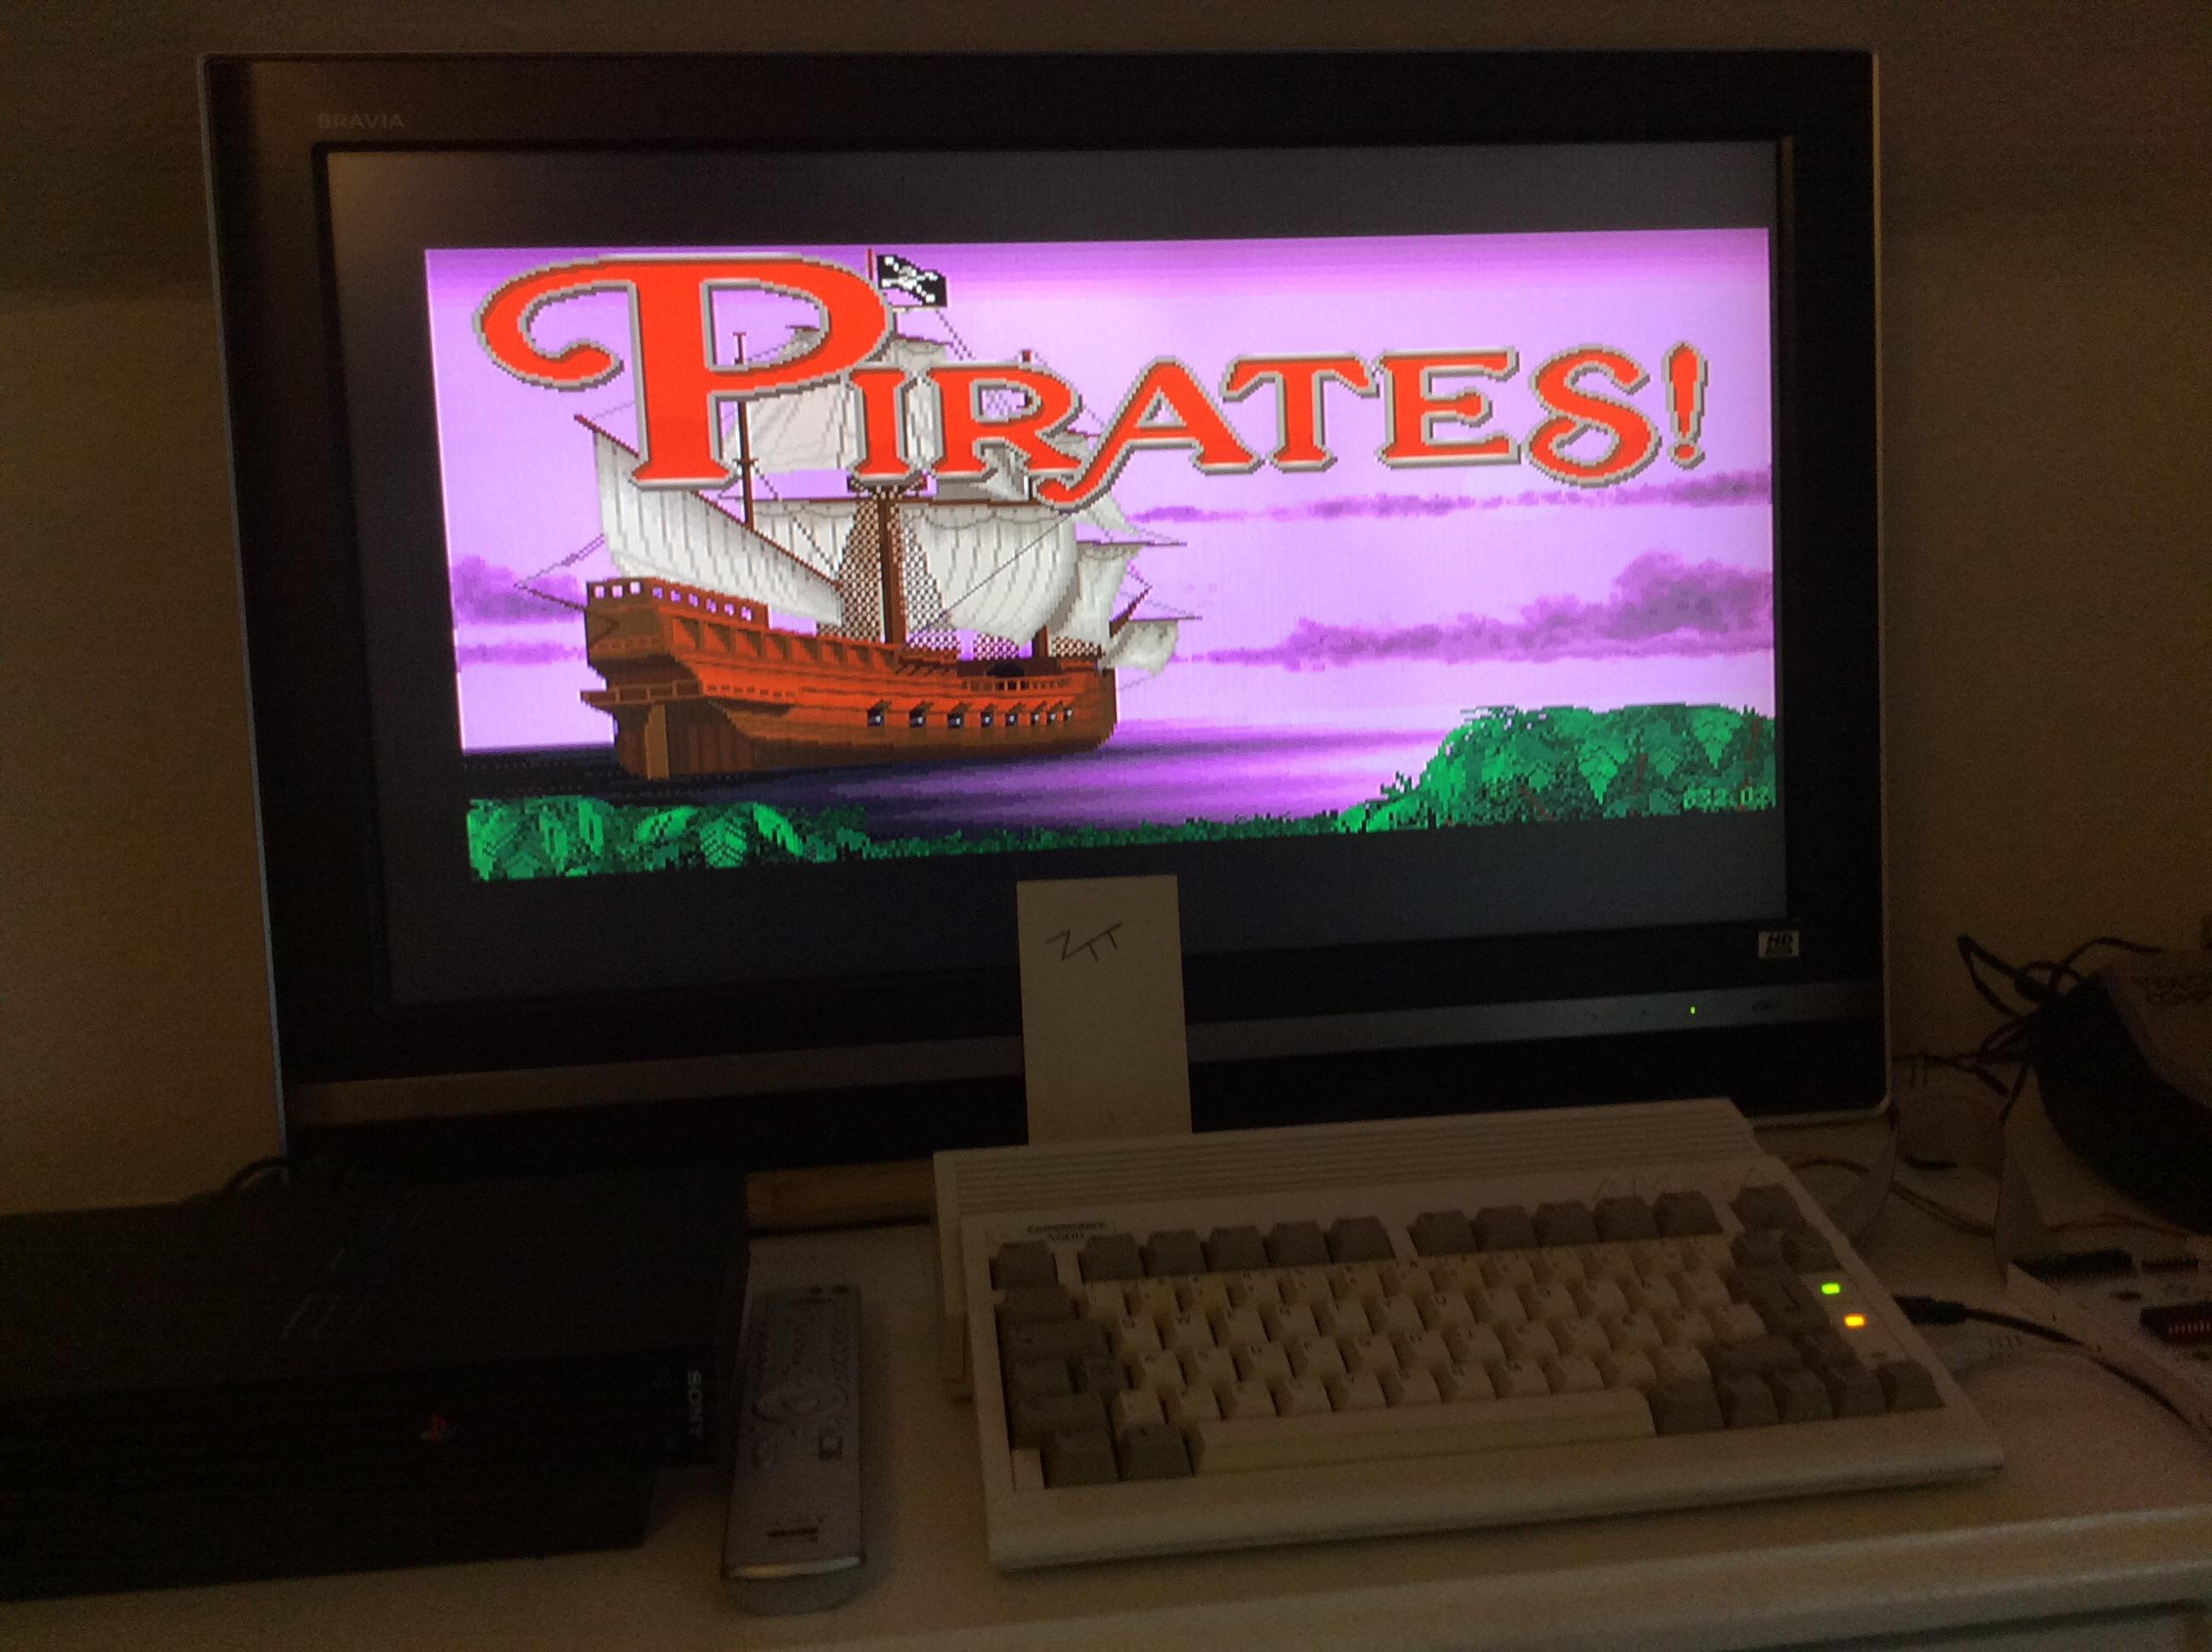 Frankie: Pirates [Acres] (Amiga) 300 points on 2016-09-22 12:05:29